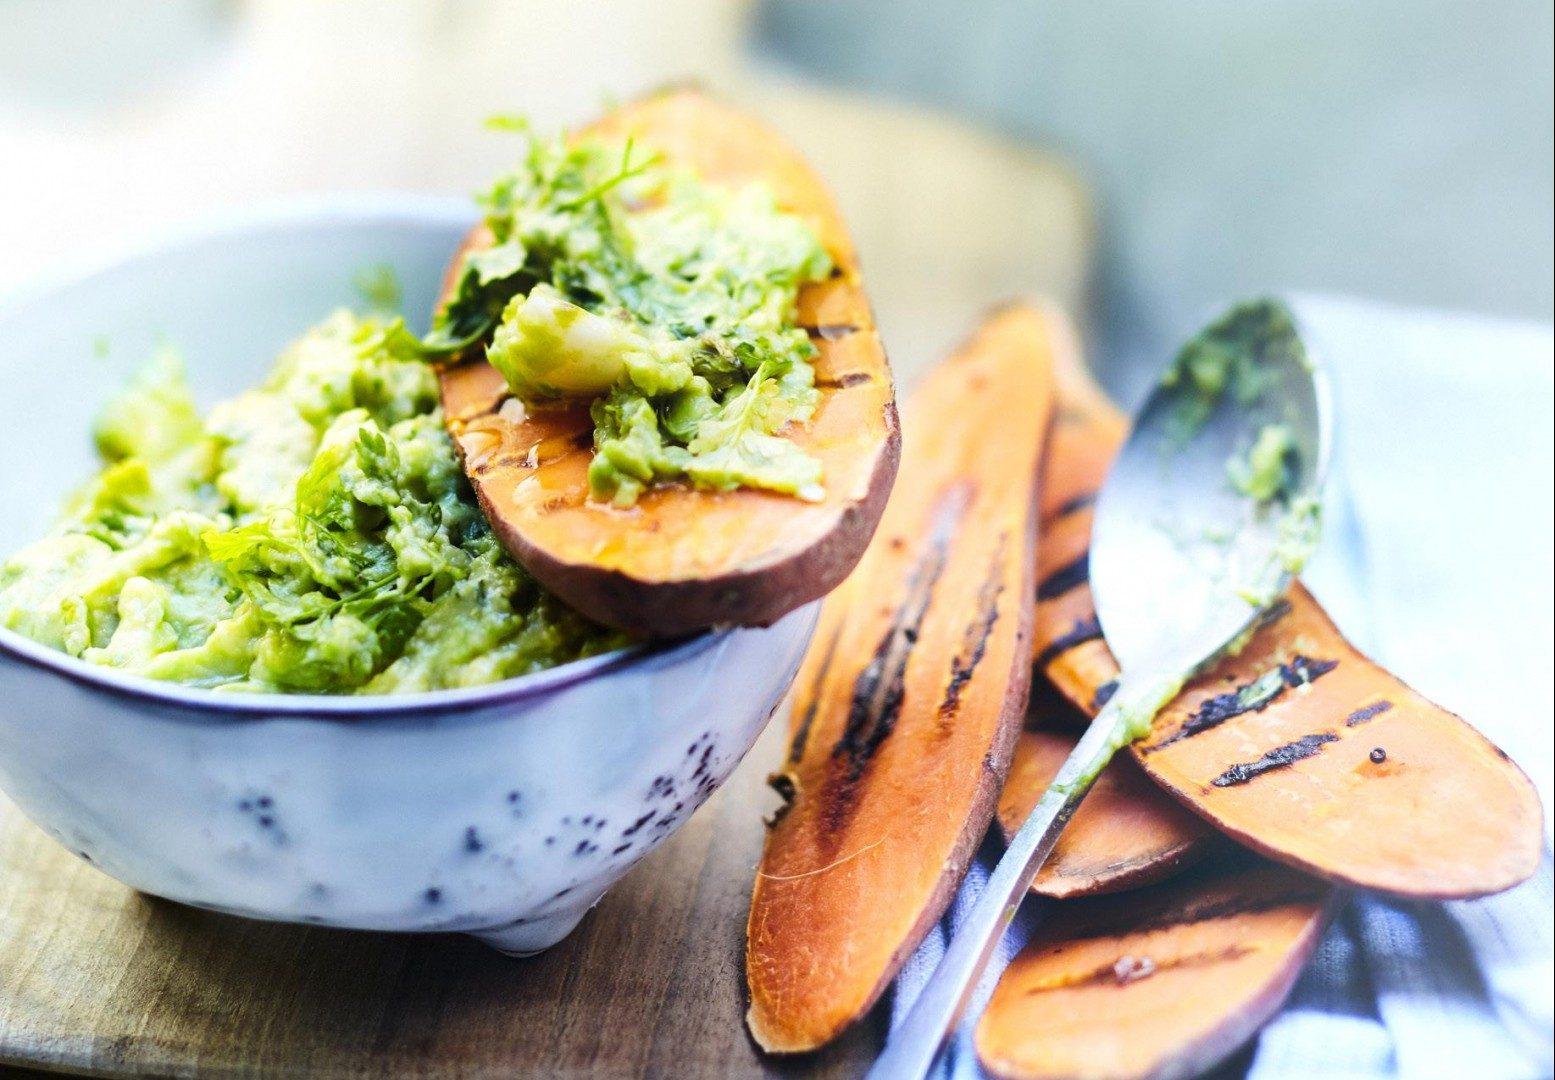 Sweet Potato Toast: Η γλυκοπατάτα όπως δεν την έχεις δοκιμάσει ποτέ Μια παραλλαγή του αγαπημένου μας πρωινού γεύματος που θα μας γεμίσει ενέργεια και θα μας κάνει να ξεφύγουμε για λίγο απο τα συνηθισμένα.